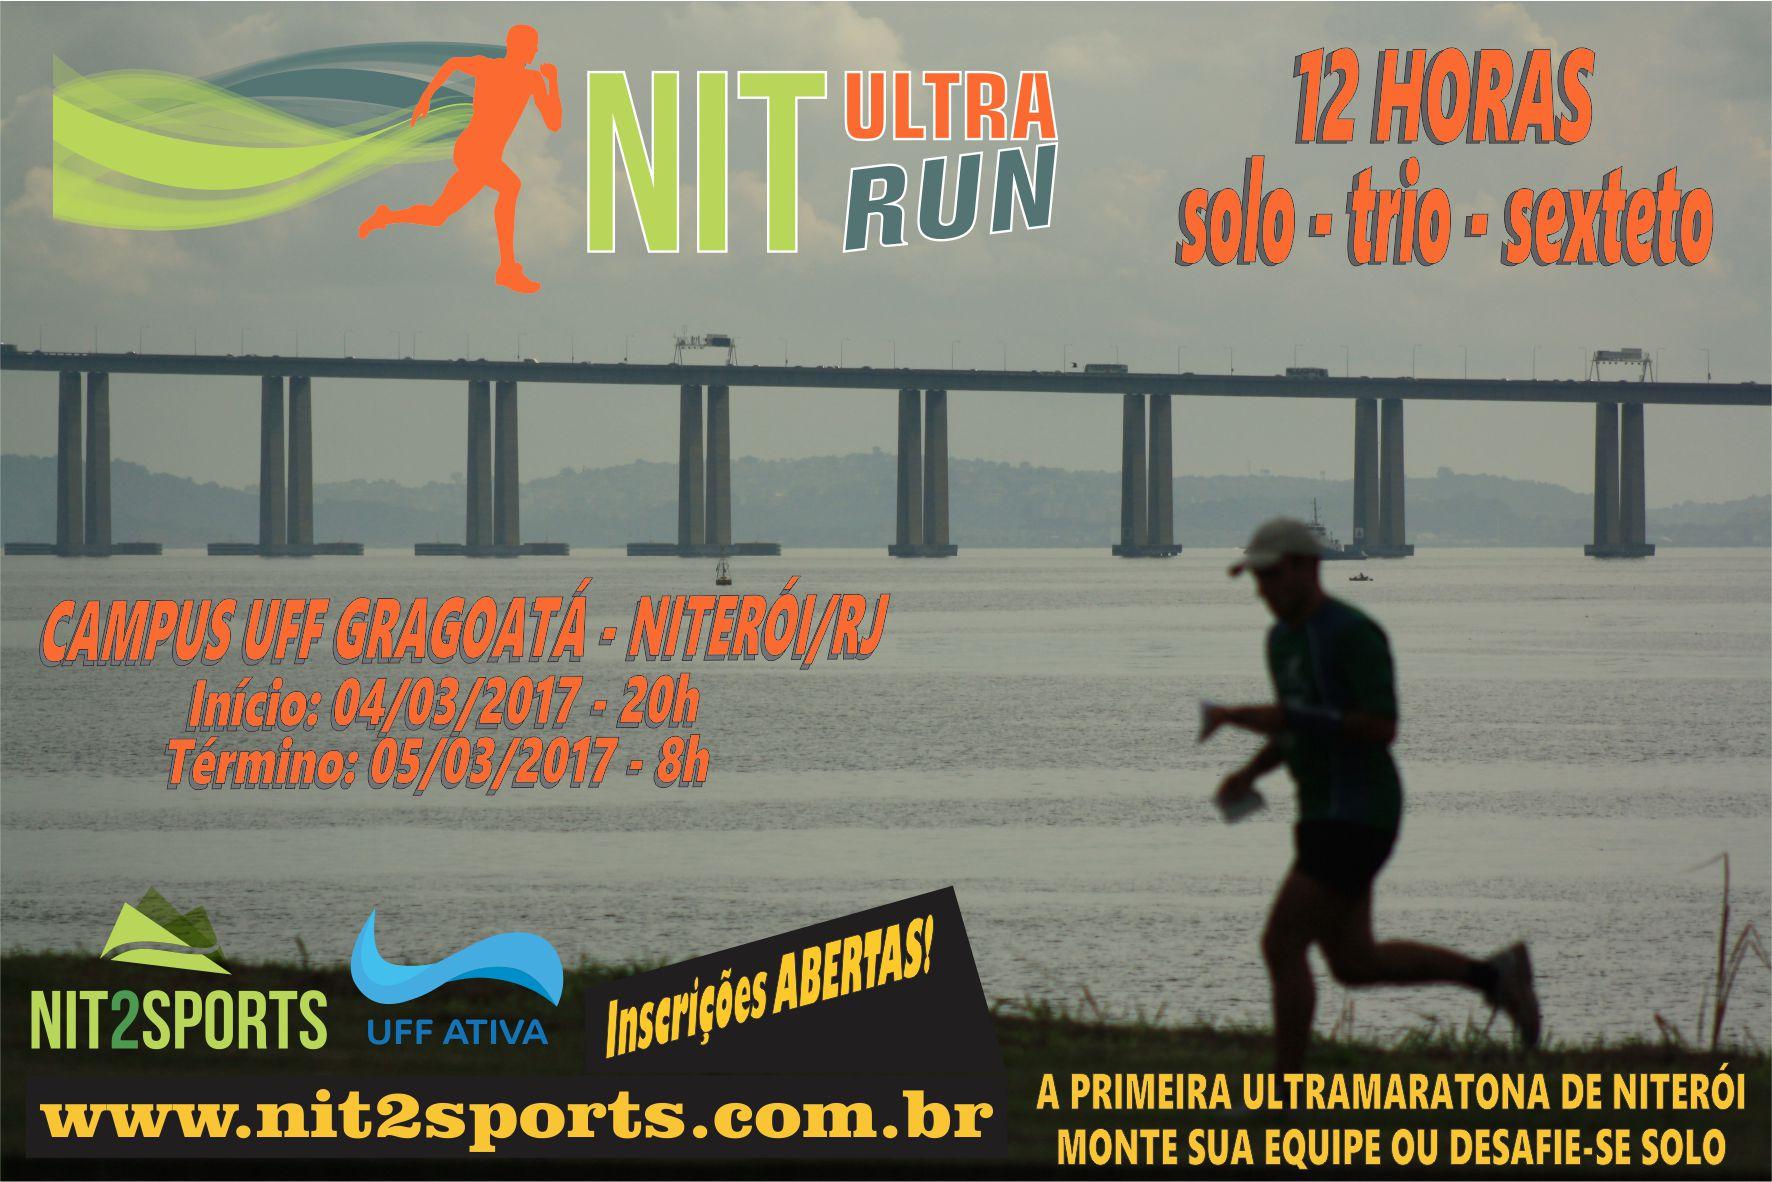 news-nit-ultra-run